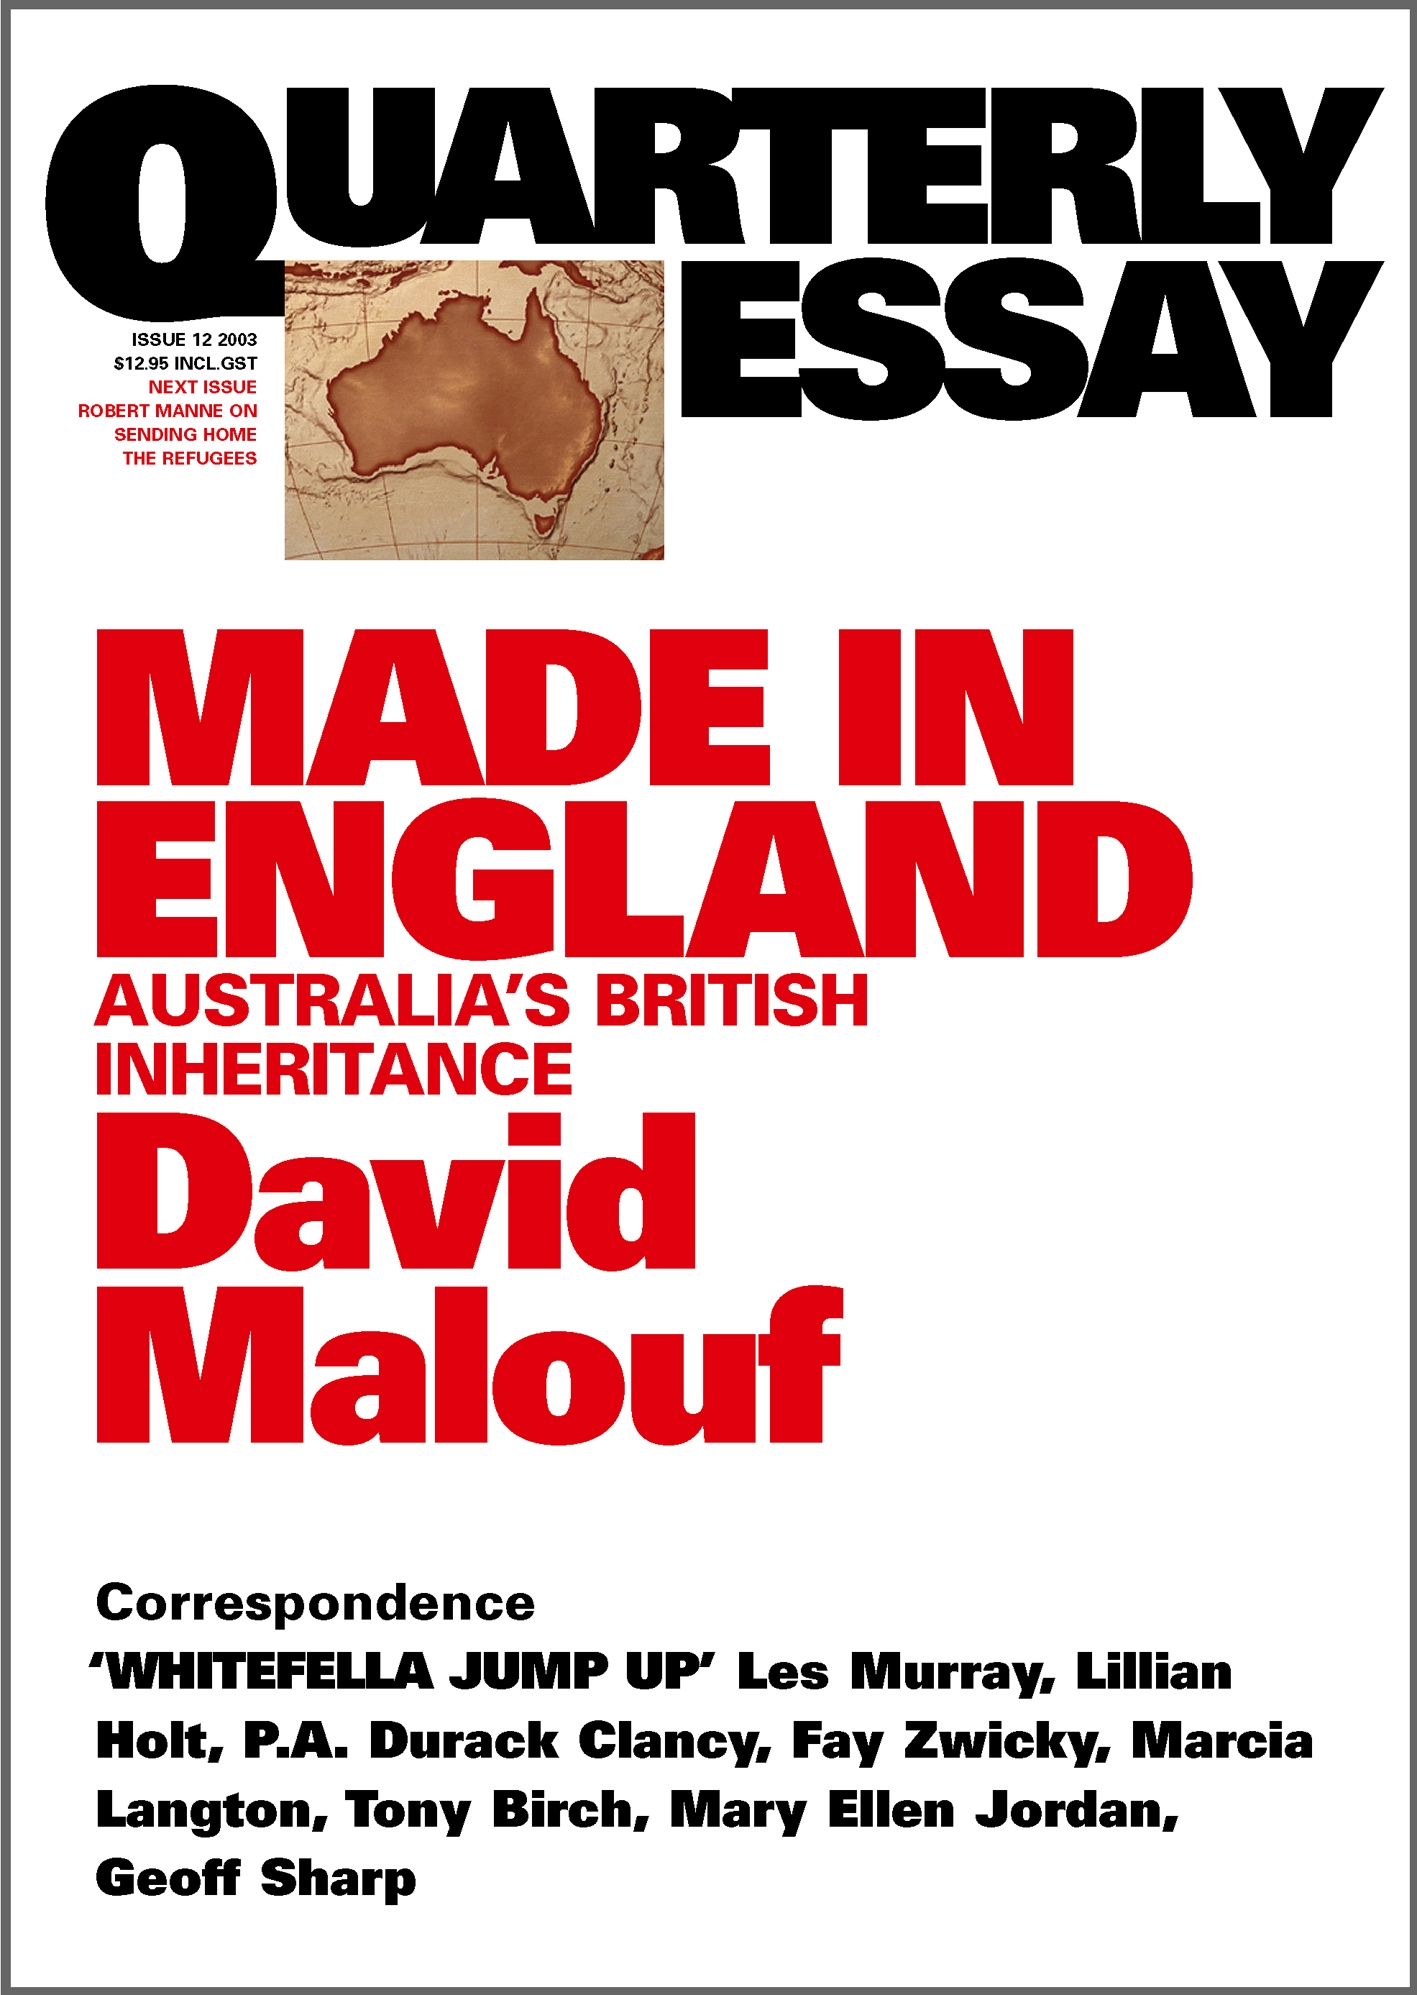 children in malouf essay Essays on malouf we have found 15 essays on malouf david malouf remembering babylon transgender children contents sr # topic pg introduction 2 2.